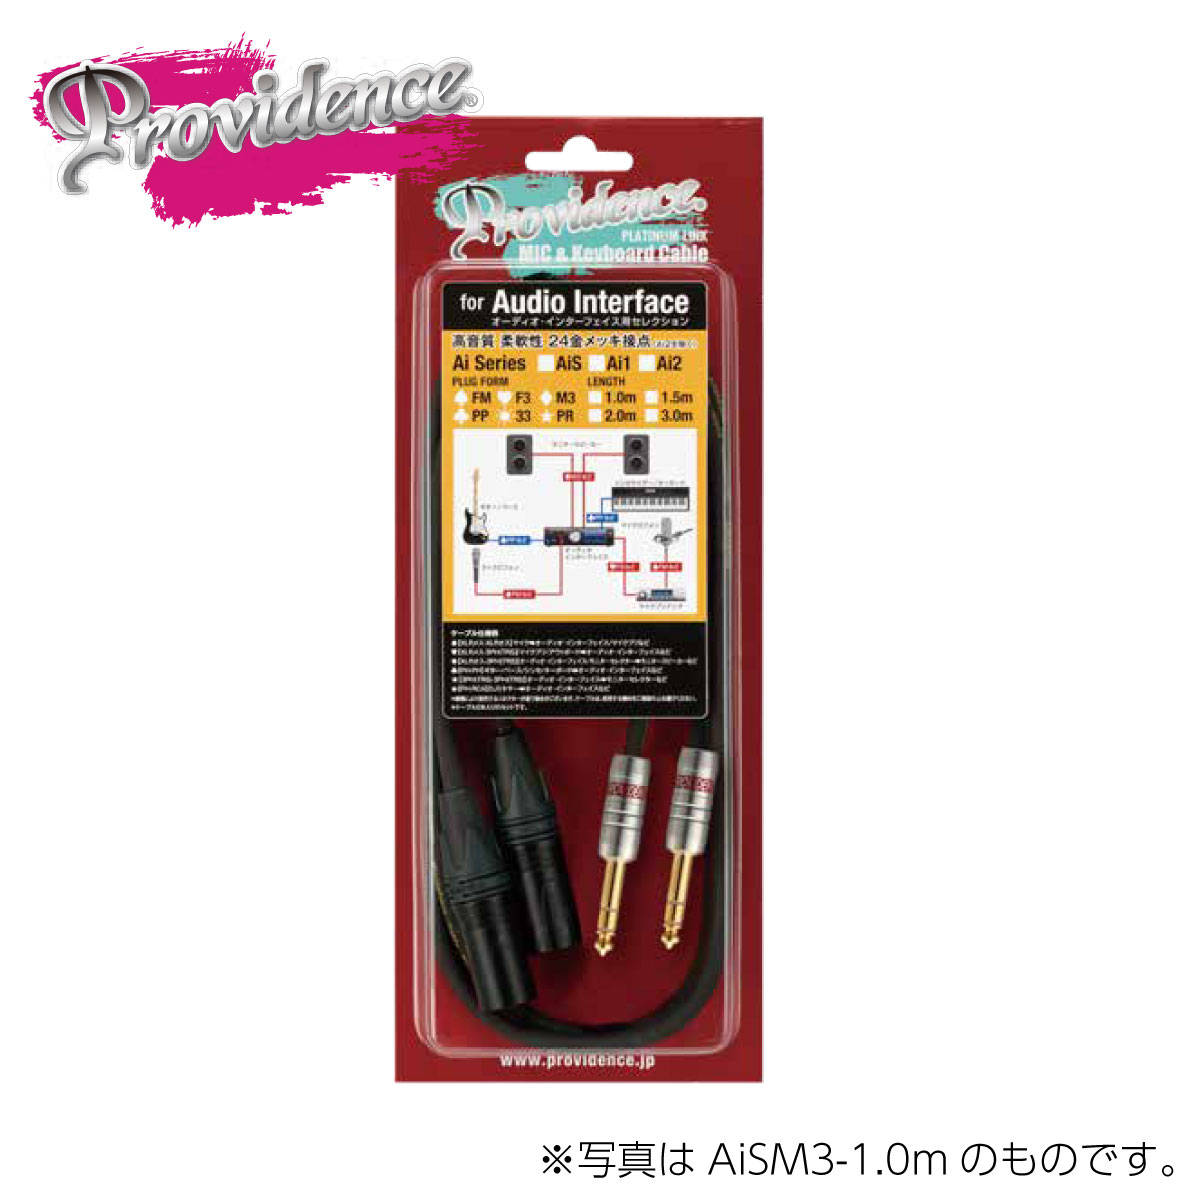 Providence Ai2-33-3.0m PLATINUM LINK 新品 オーディオ・インターフェイス用ケーブル[プロヴィデンス][シールド][Cable][Audio Interface,DTM]